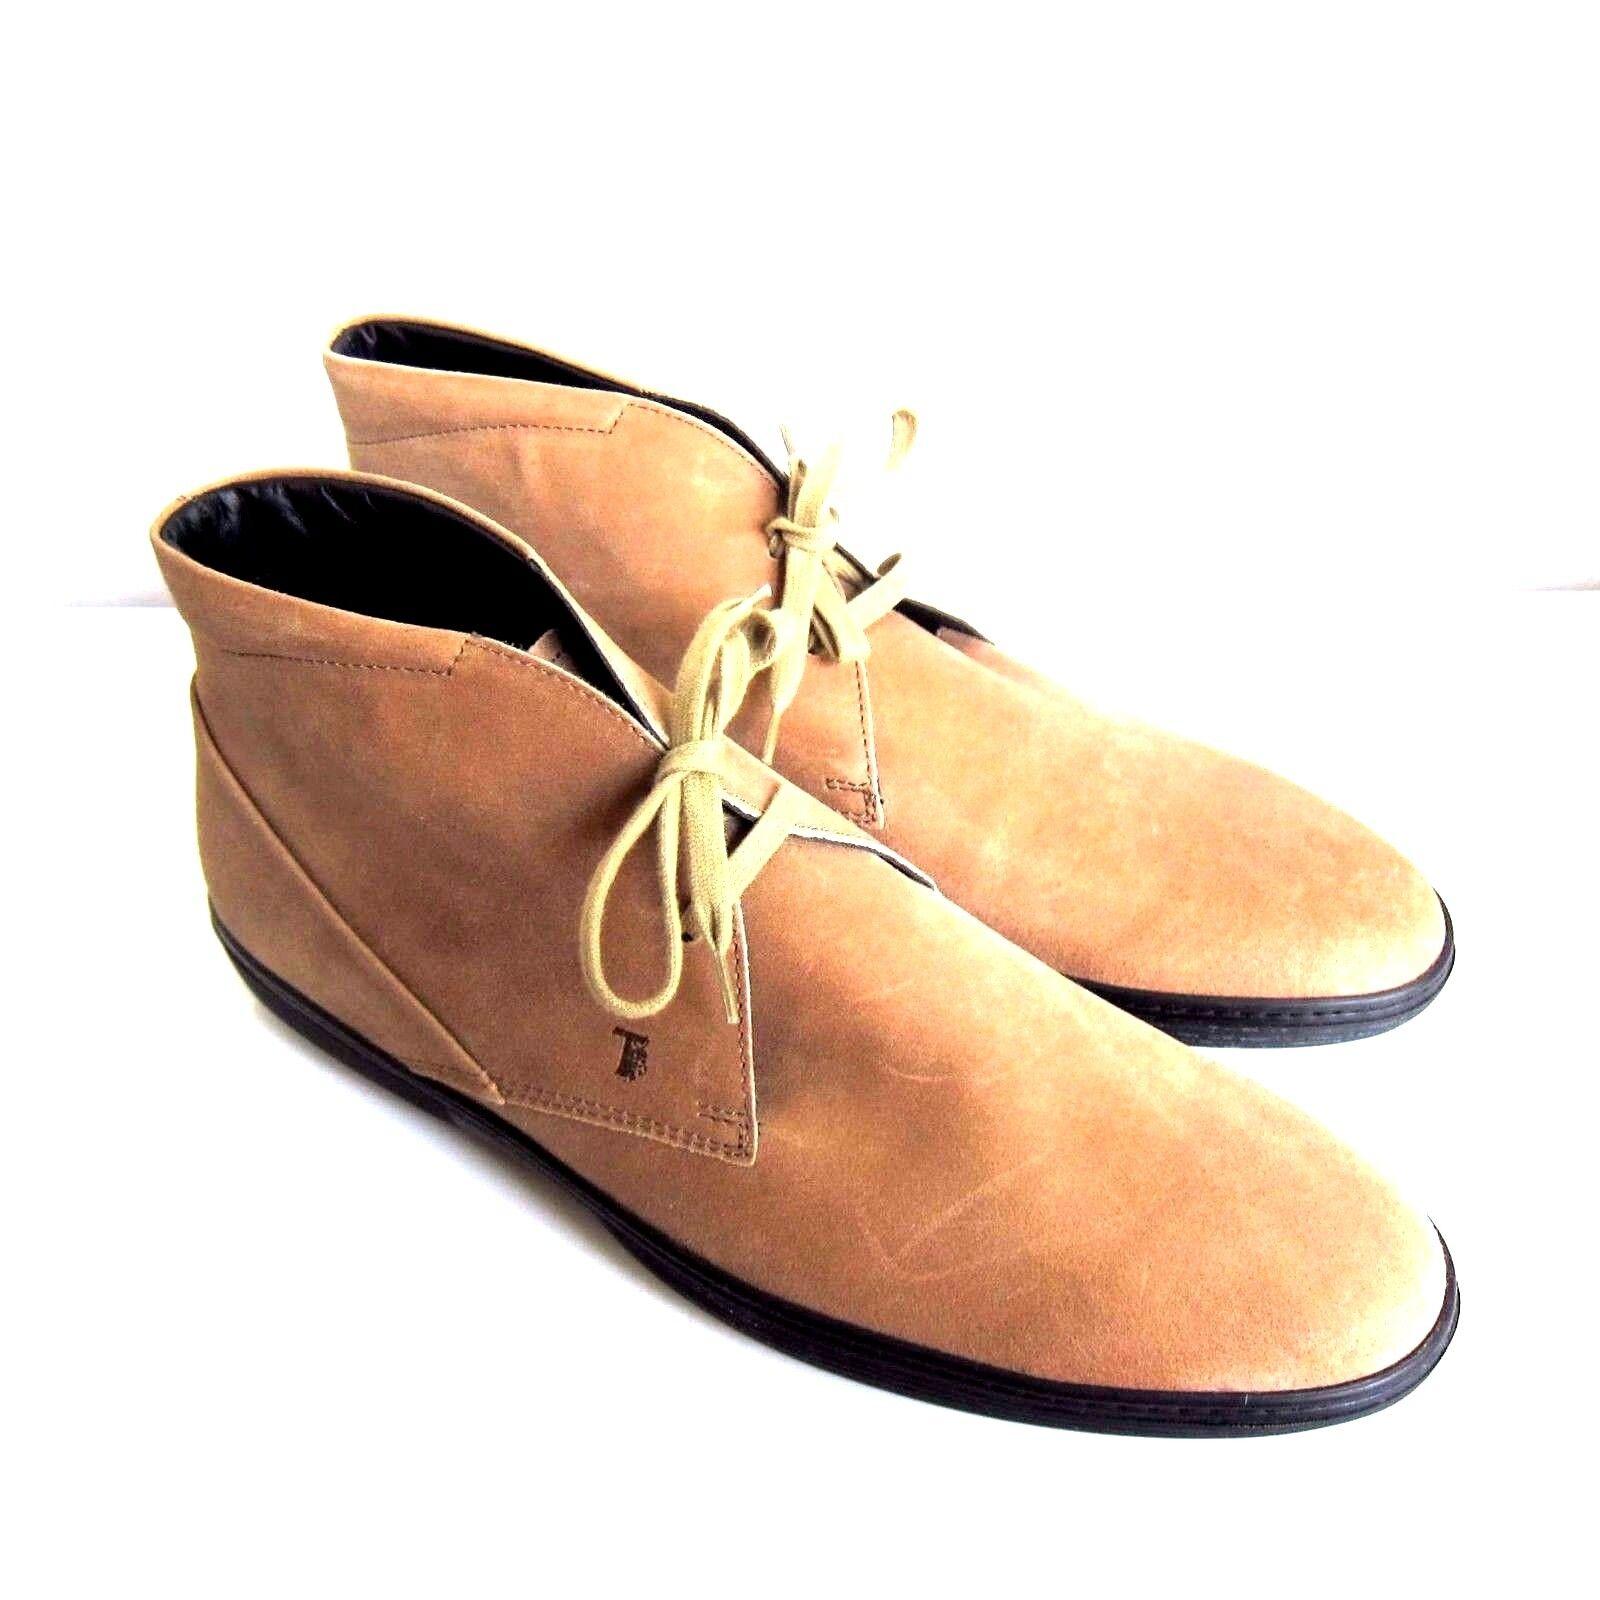 Scarpe casual da uomo  C-1333999 New Tods Polacco Peteri Shoes Size US 11.5 Marked 10.5